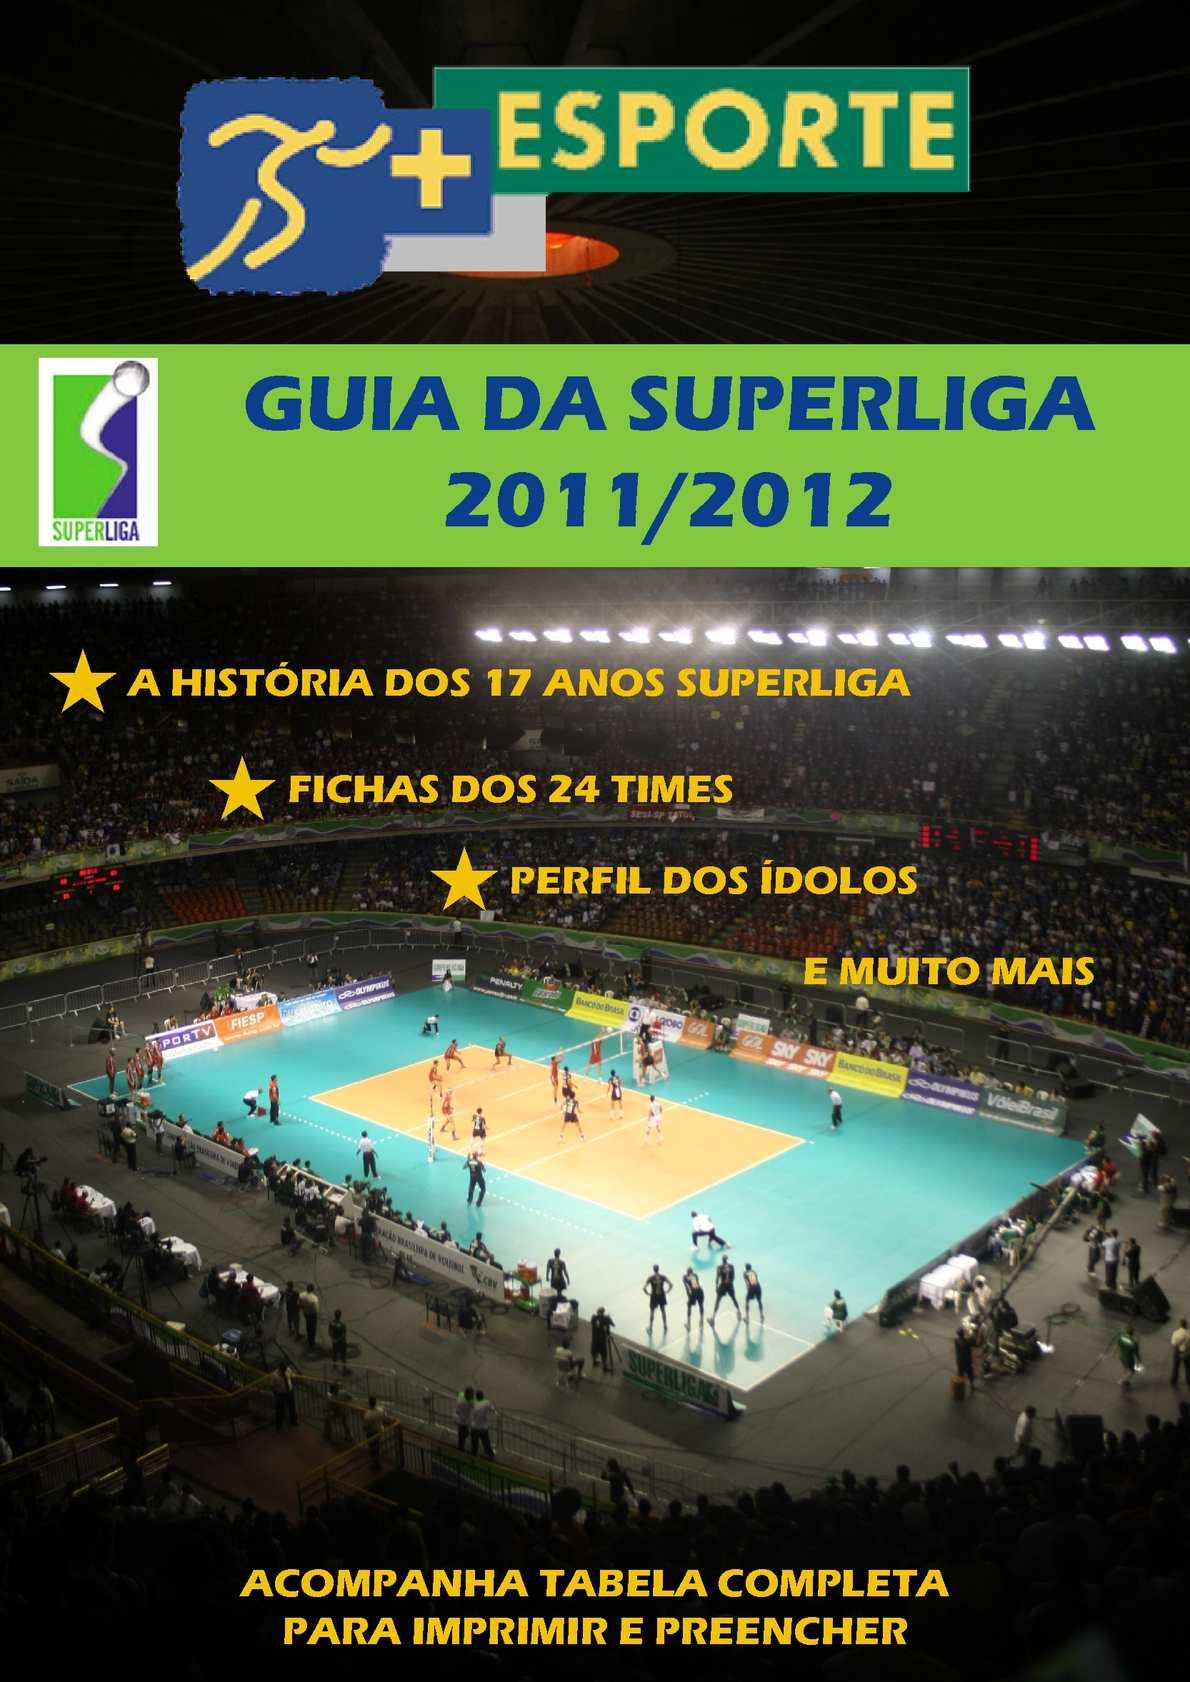 00b26542fd Calaméo - Guia da Superliga 2011 2012